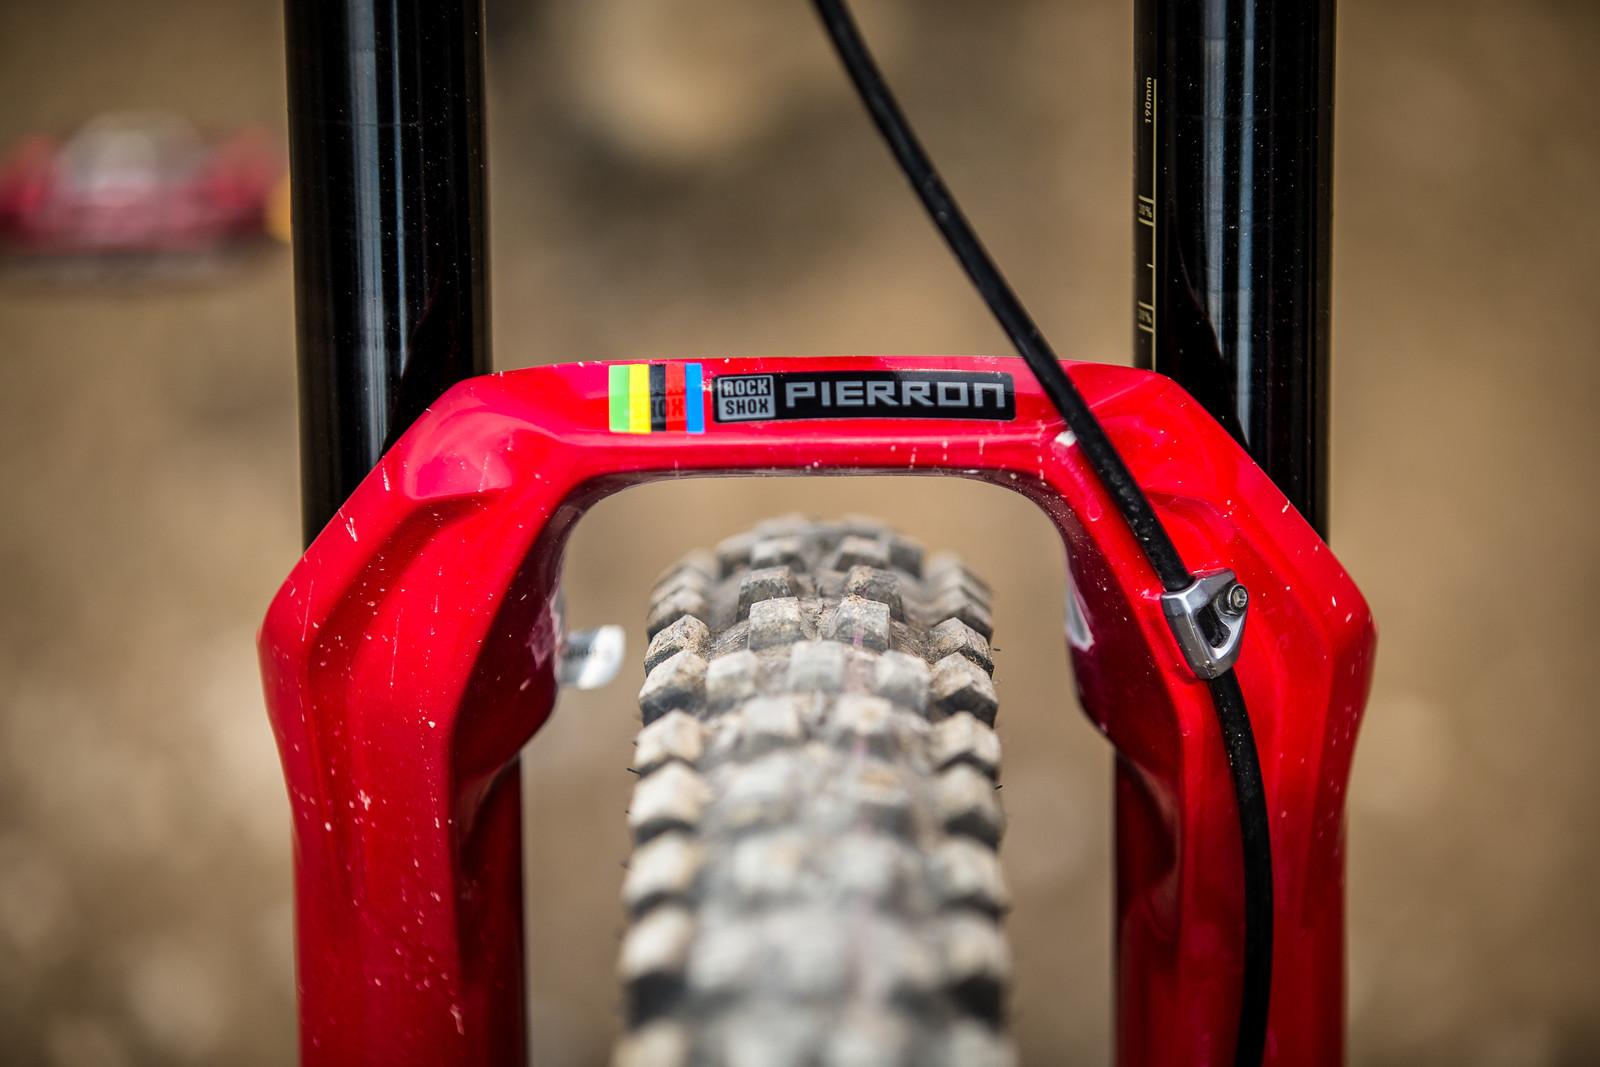 RockShox BoXXer - WINNING BIKE - Amaury Pierron's Commencal Supreme DH 29 - Mountain Biking Pictures - Vital MTB